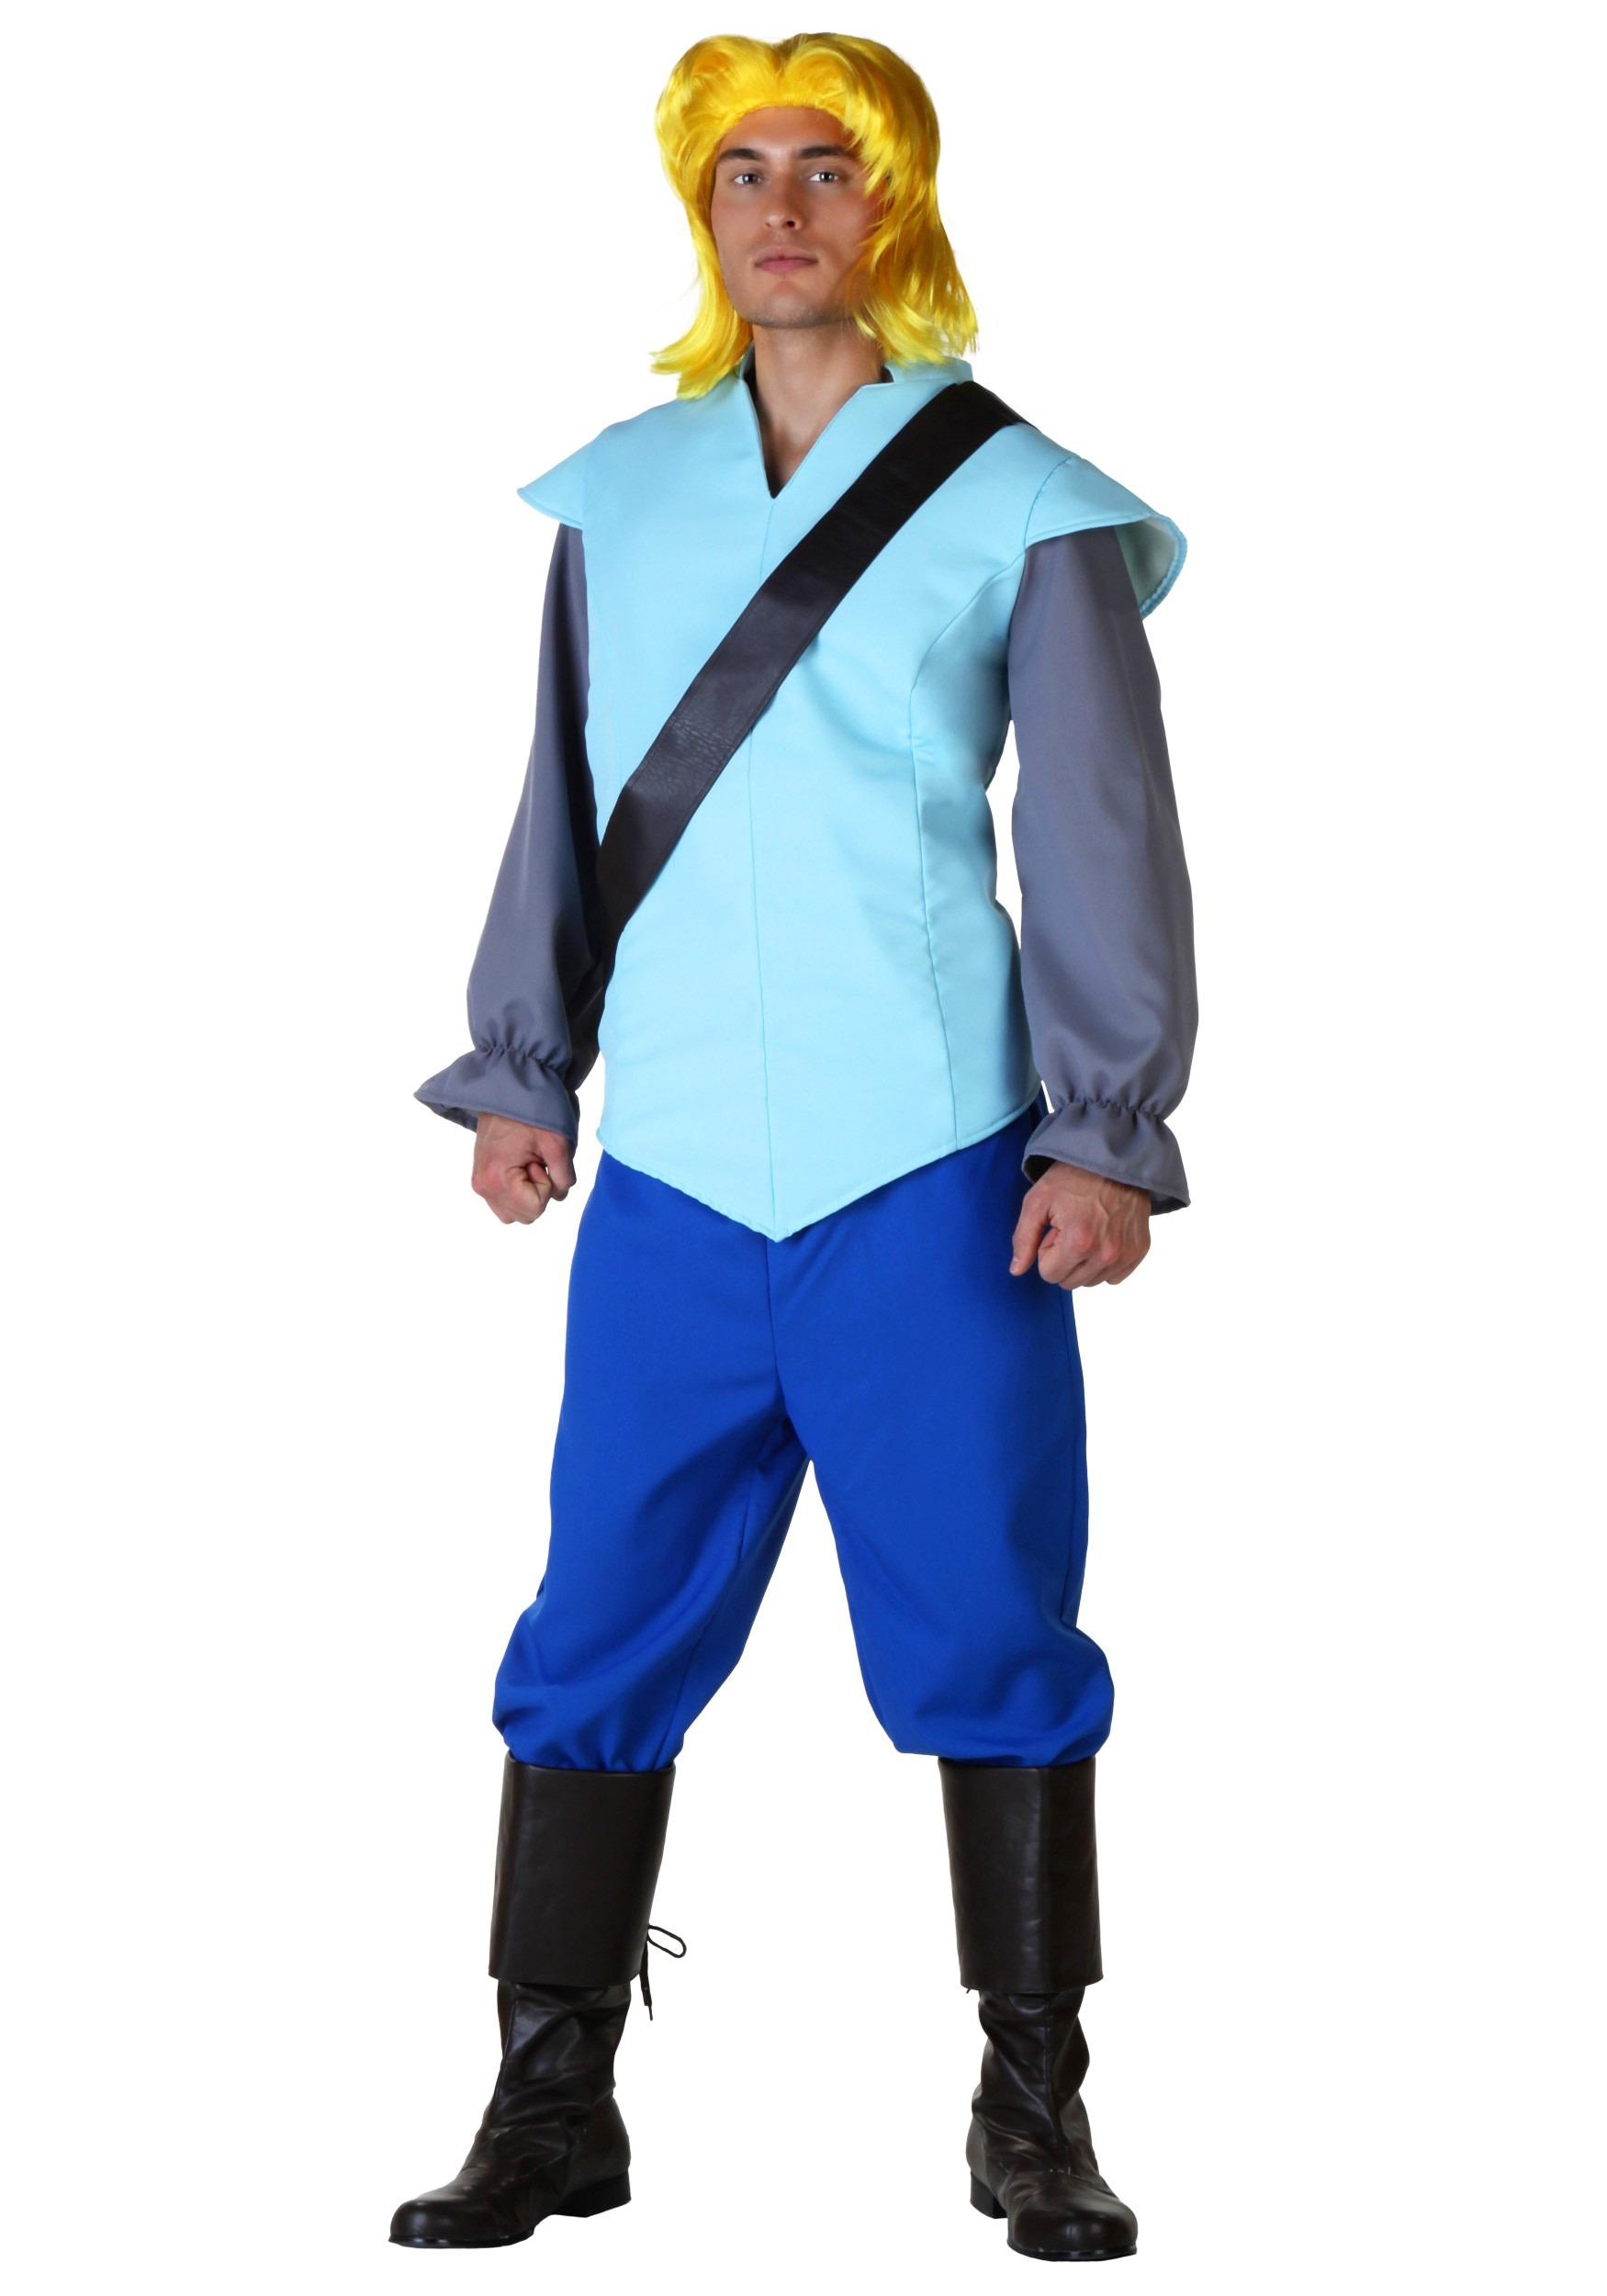 Mens john smith costume solutioingenieria Image collections